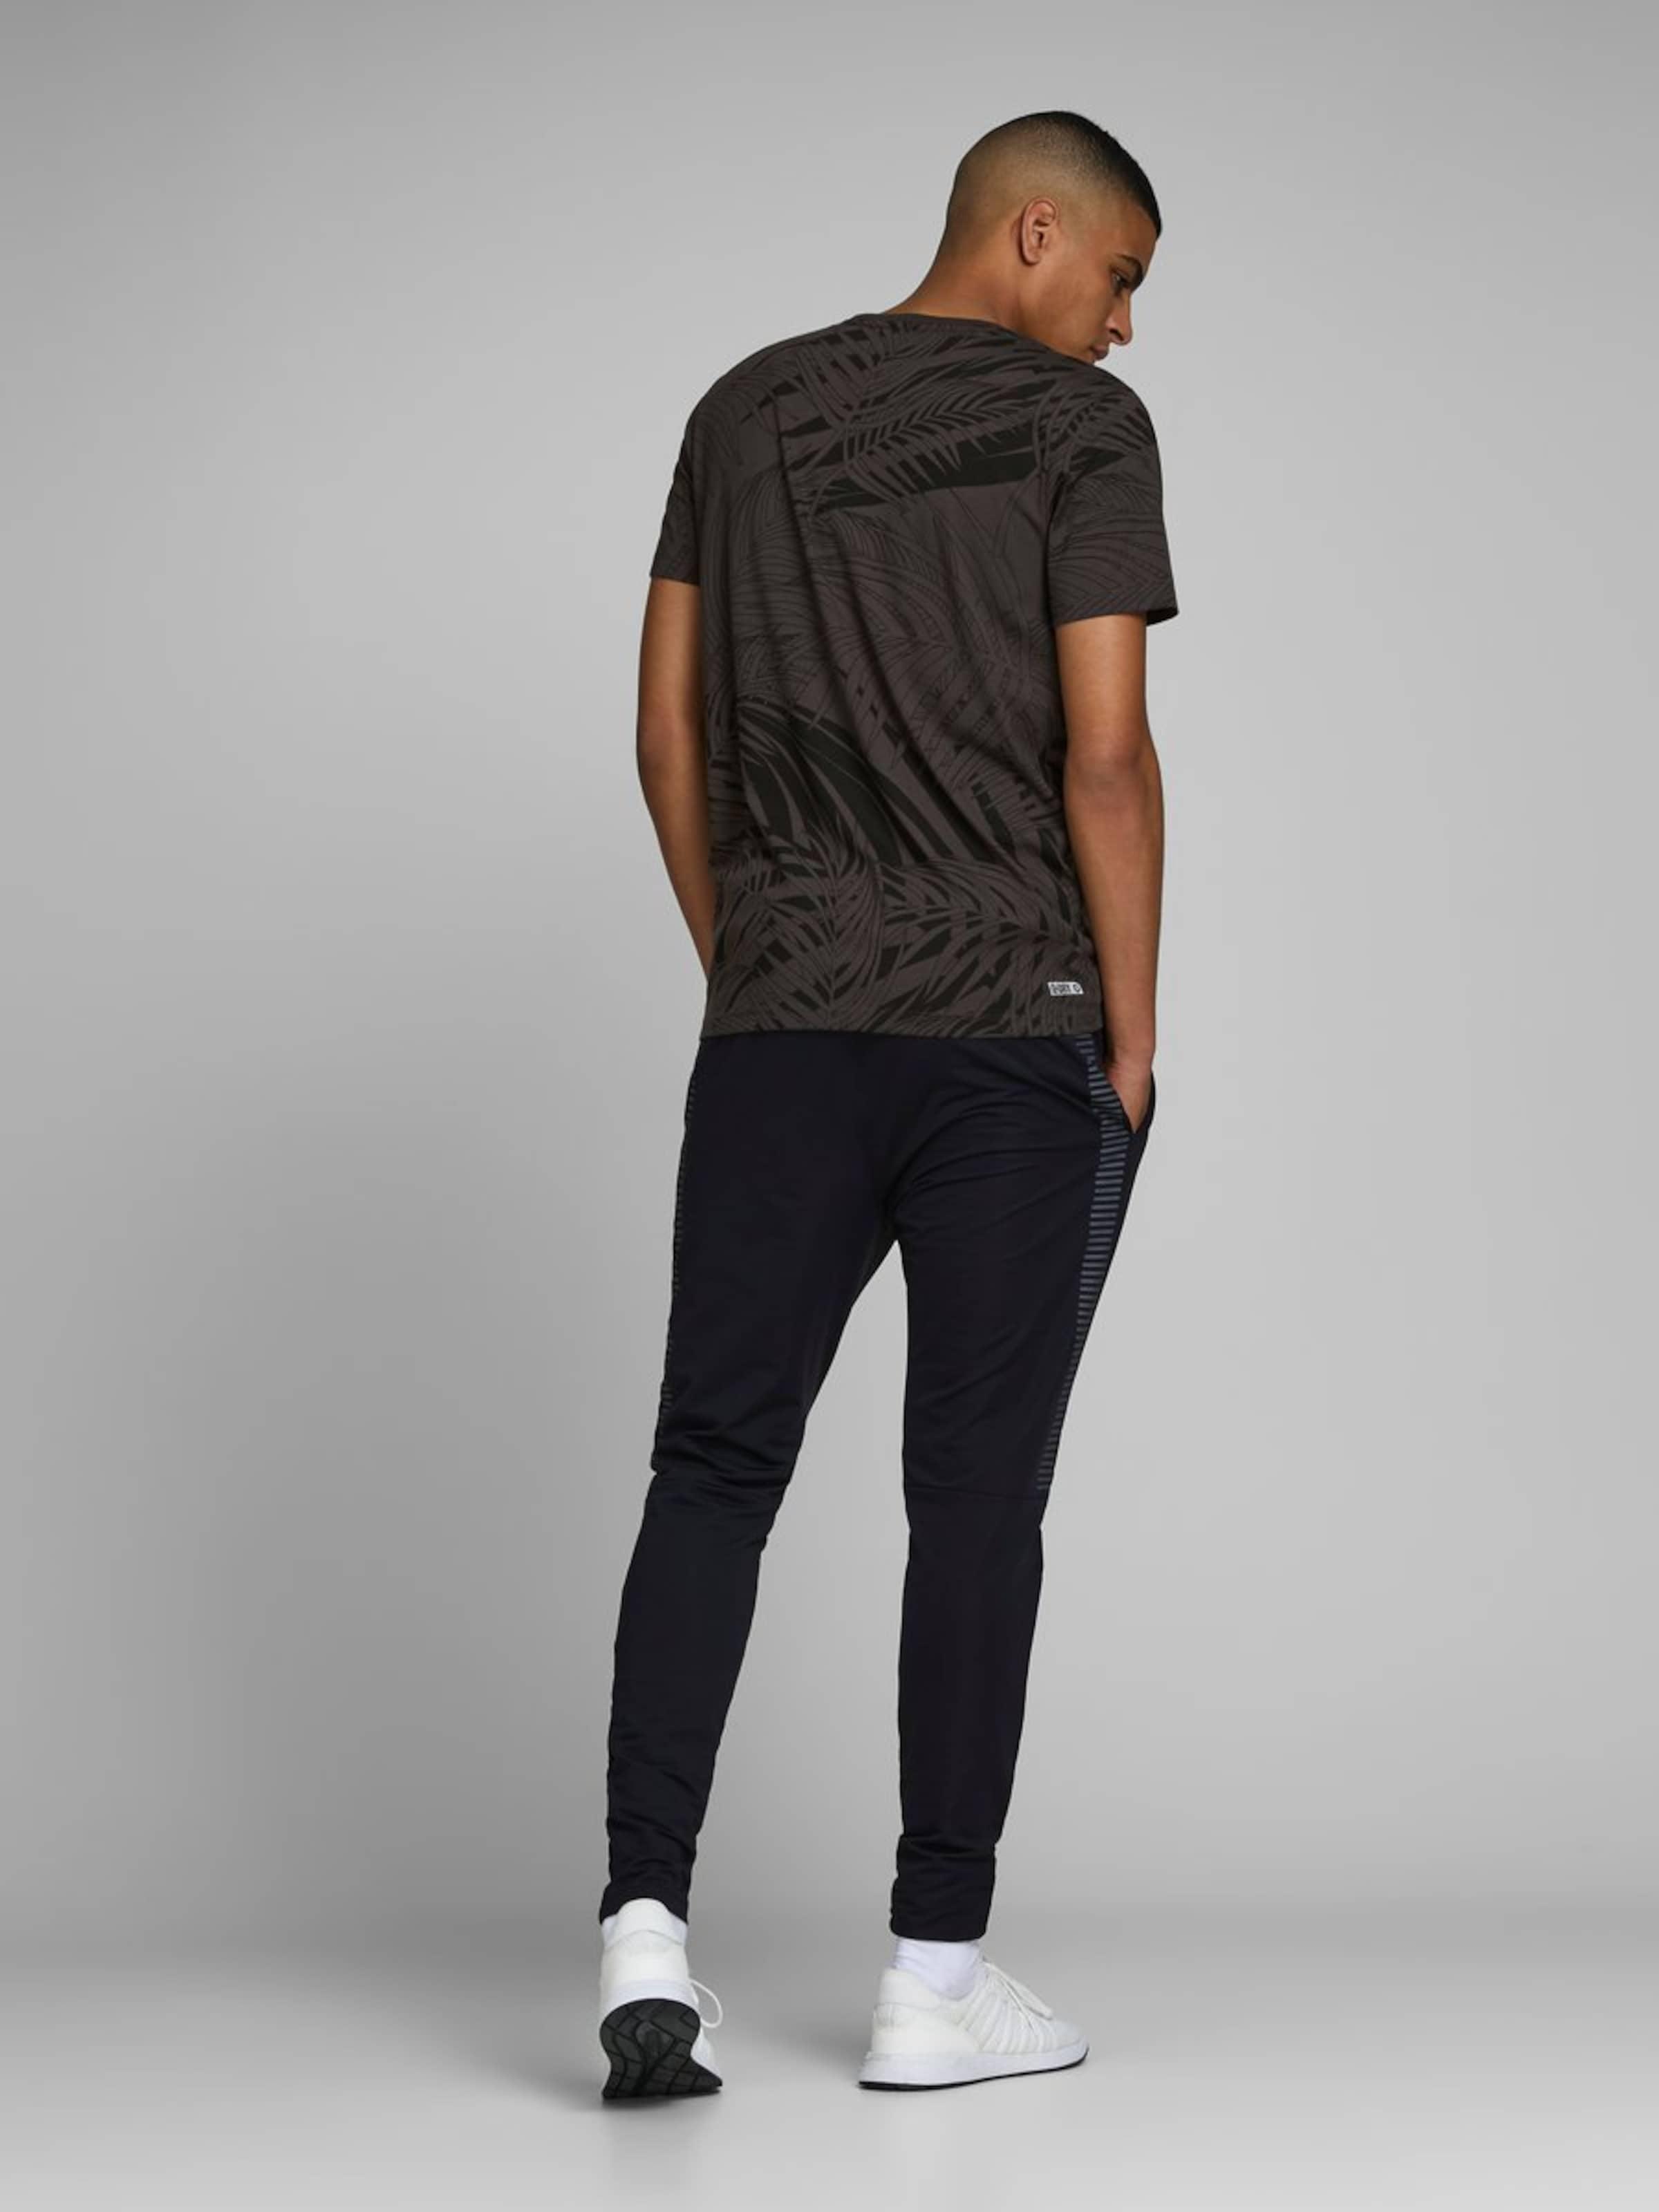 Jones BasaltgrauMischfarben Jackamp; shirt In T xeCdoQBrWE